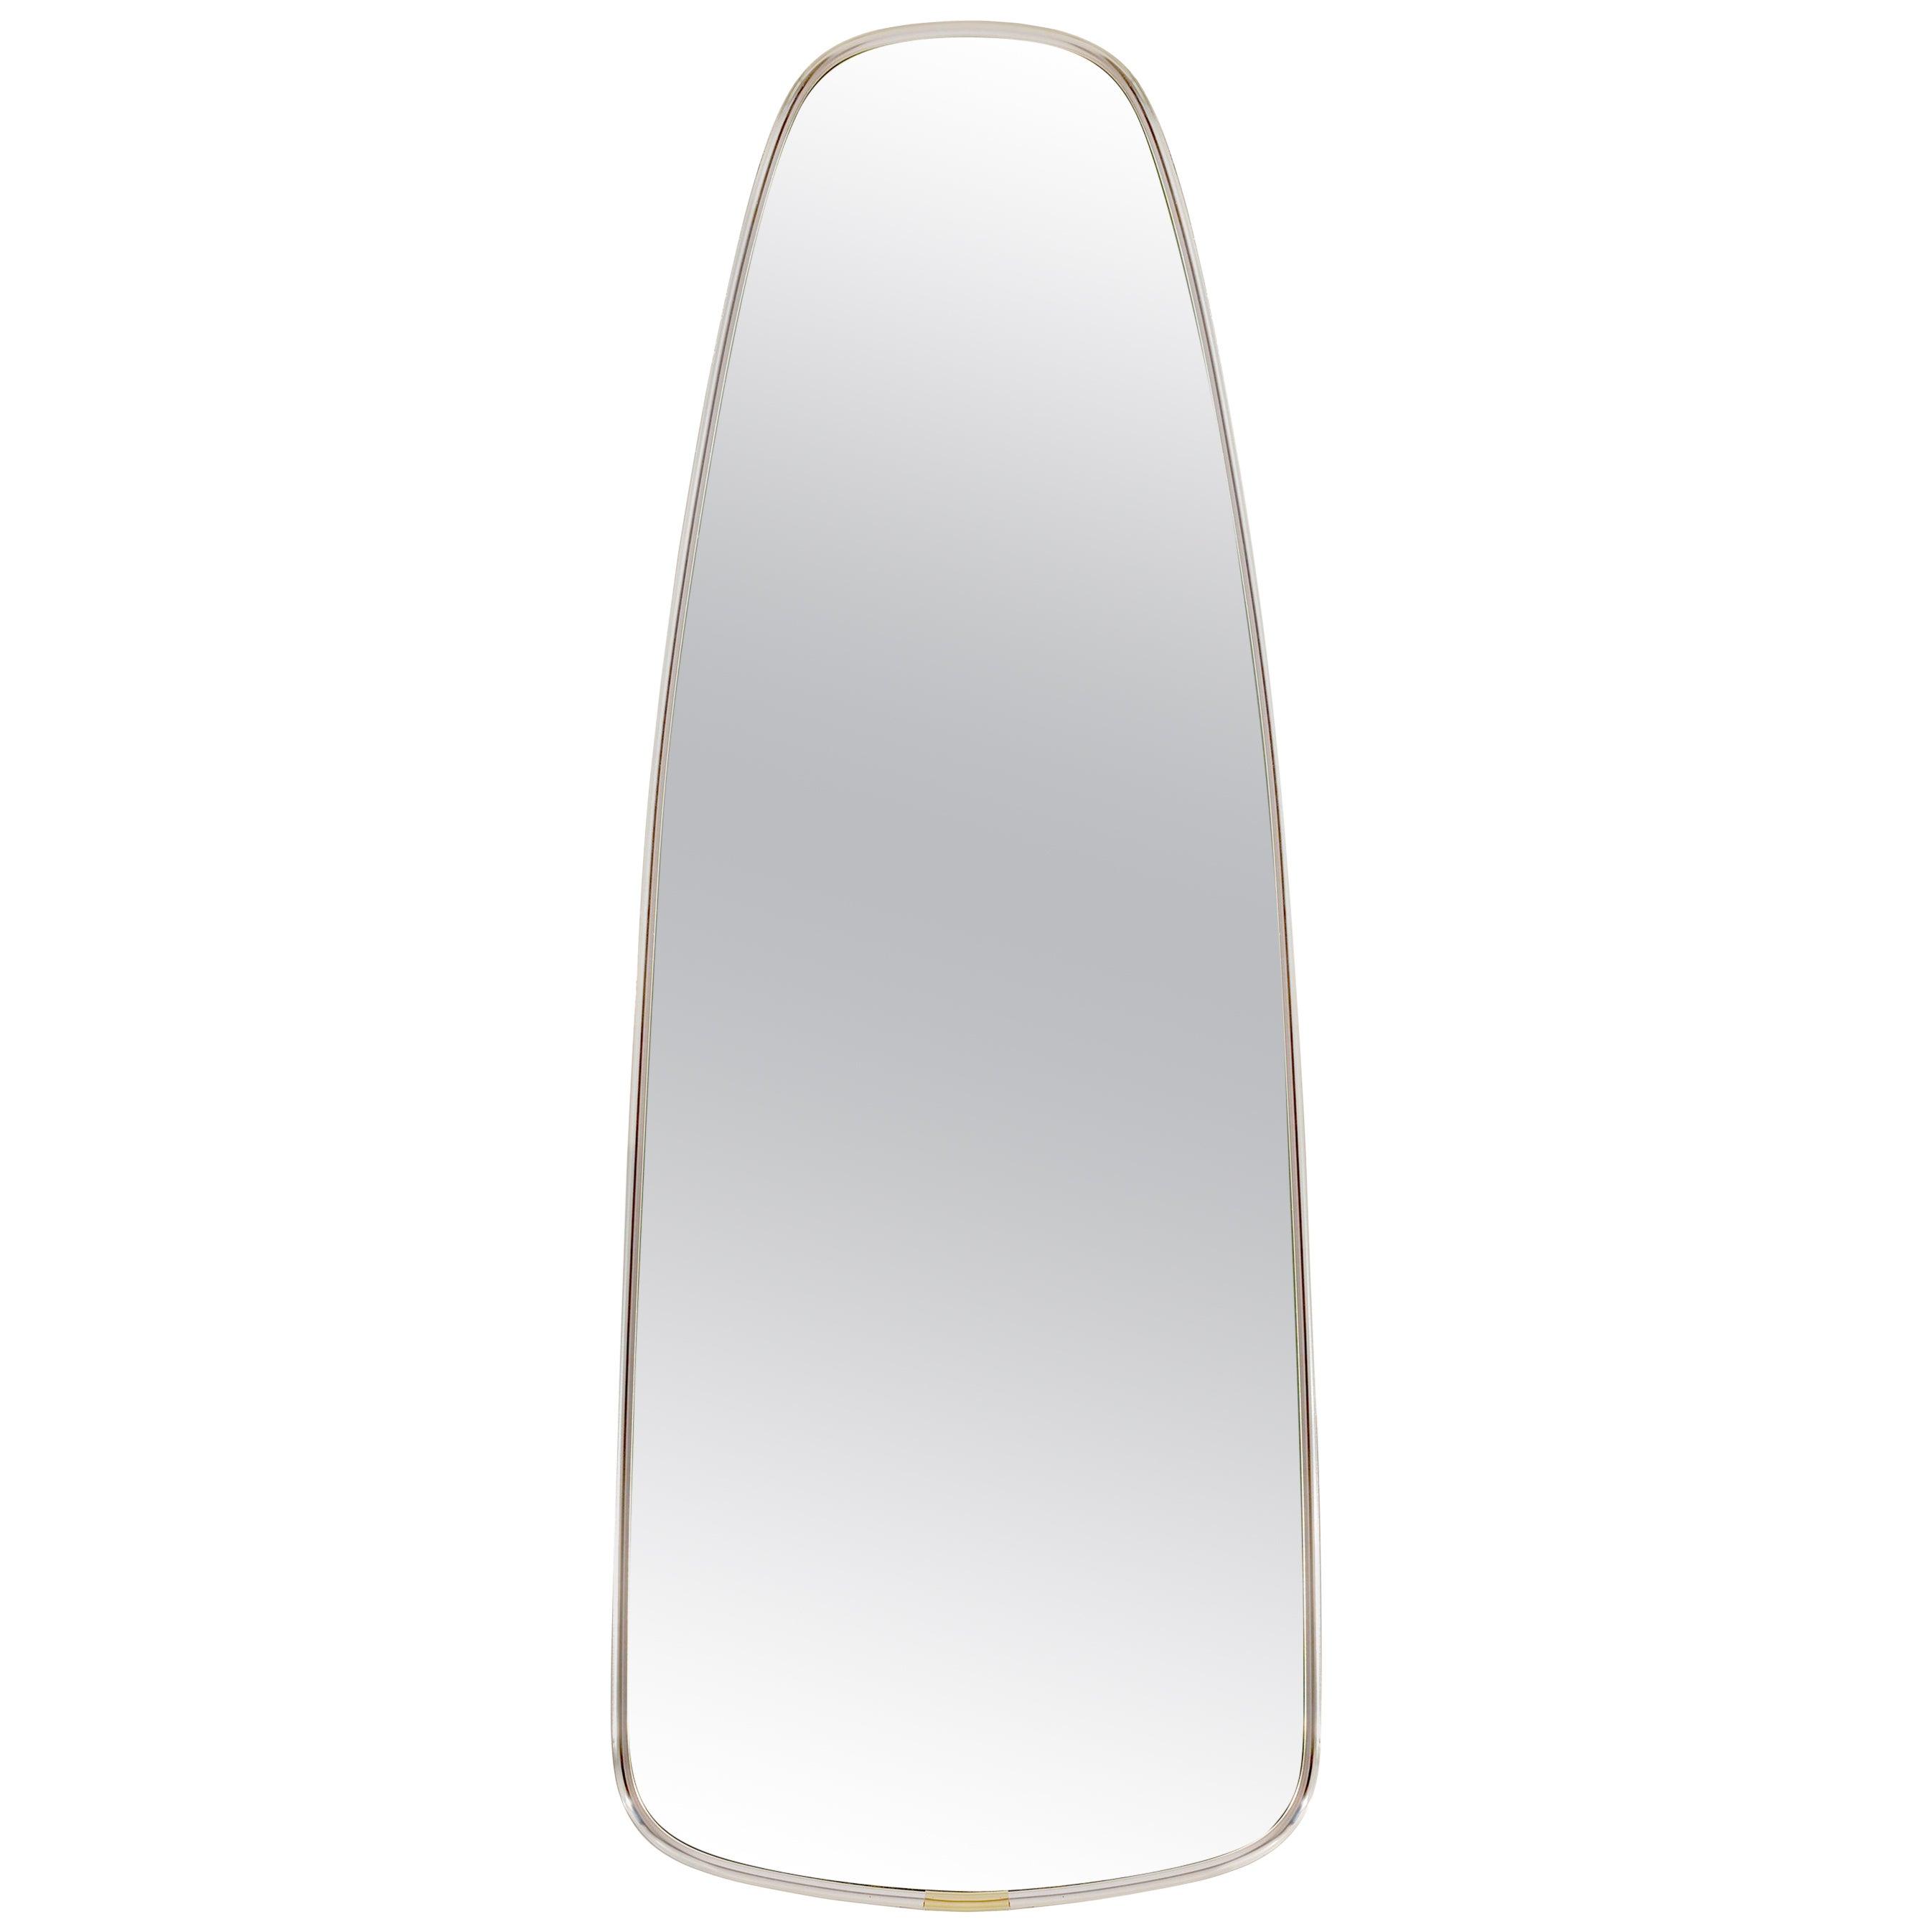 Teardrop Mirror in the Style of Karl Springer